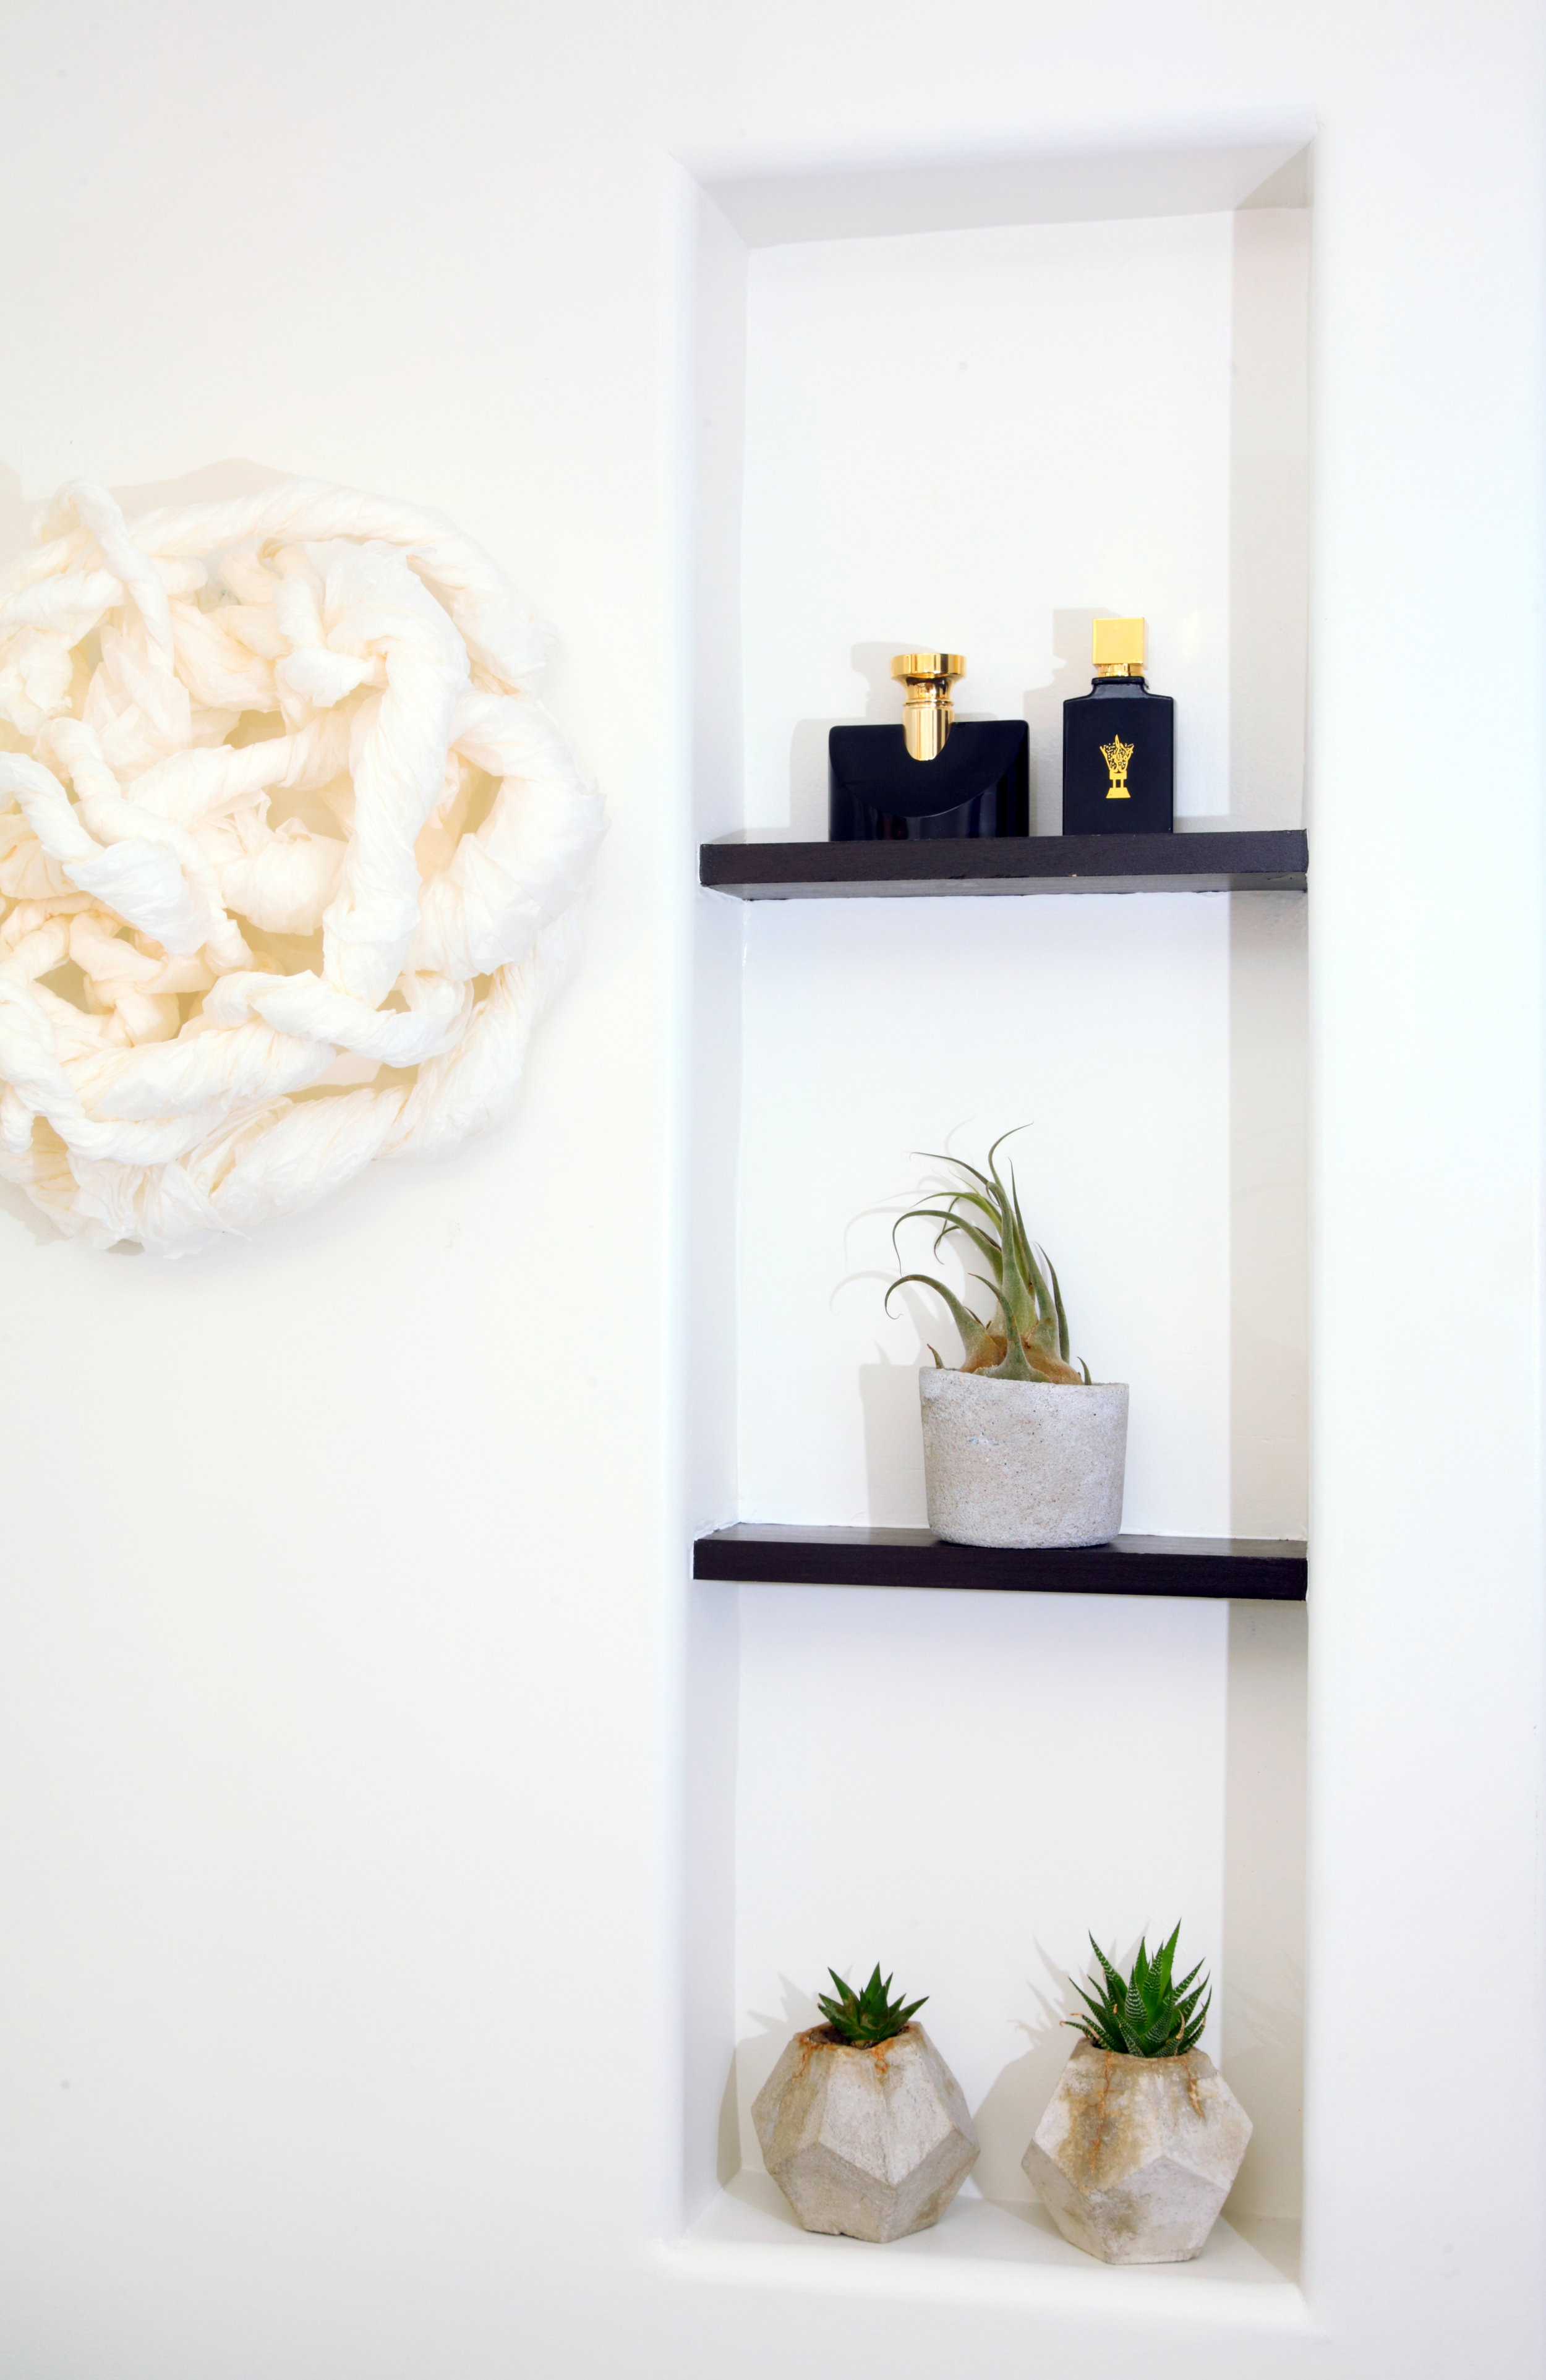 Sarah-barnard-design-modern-luxury-bathroom.jpg